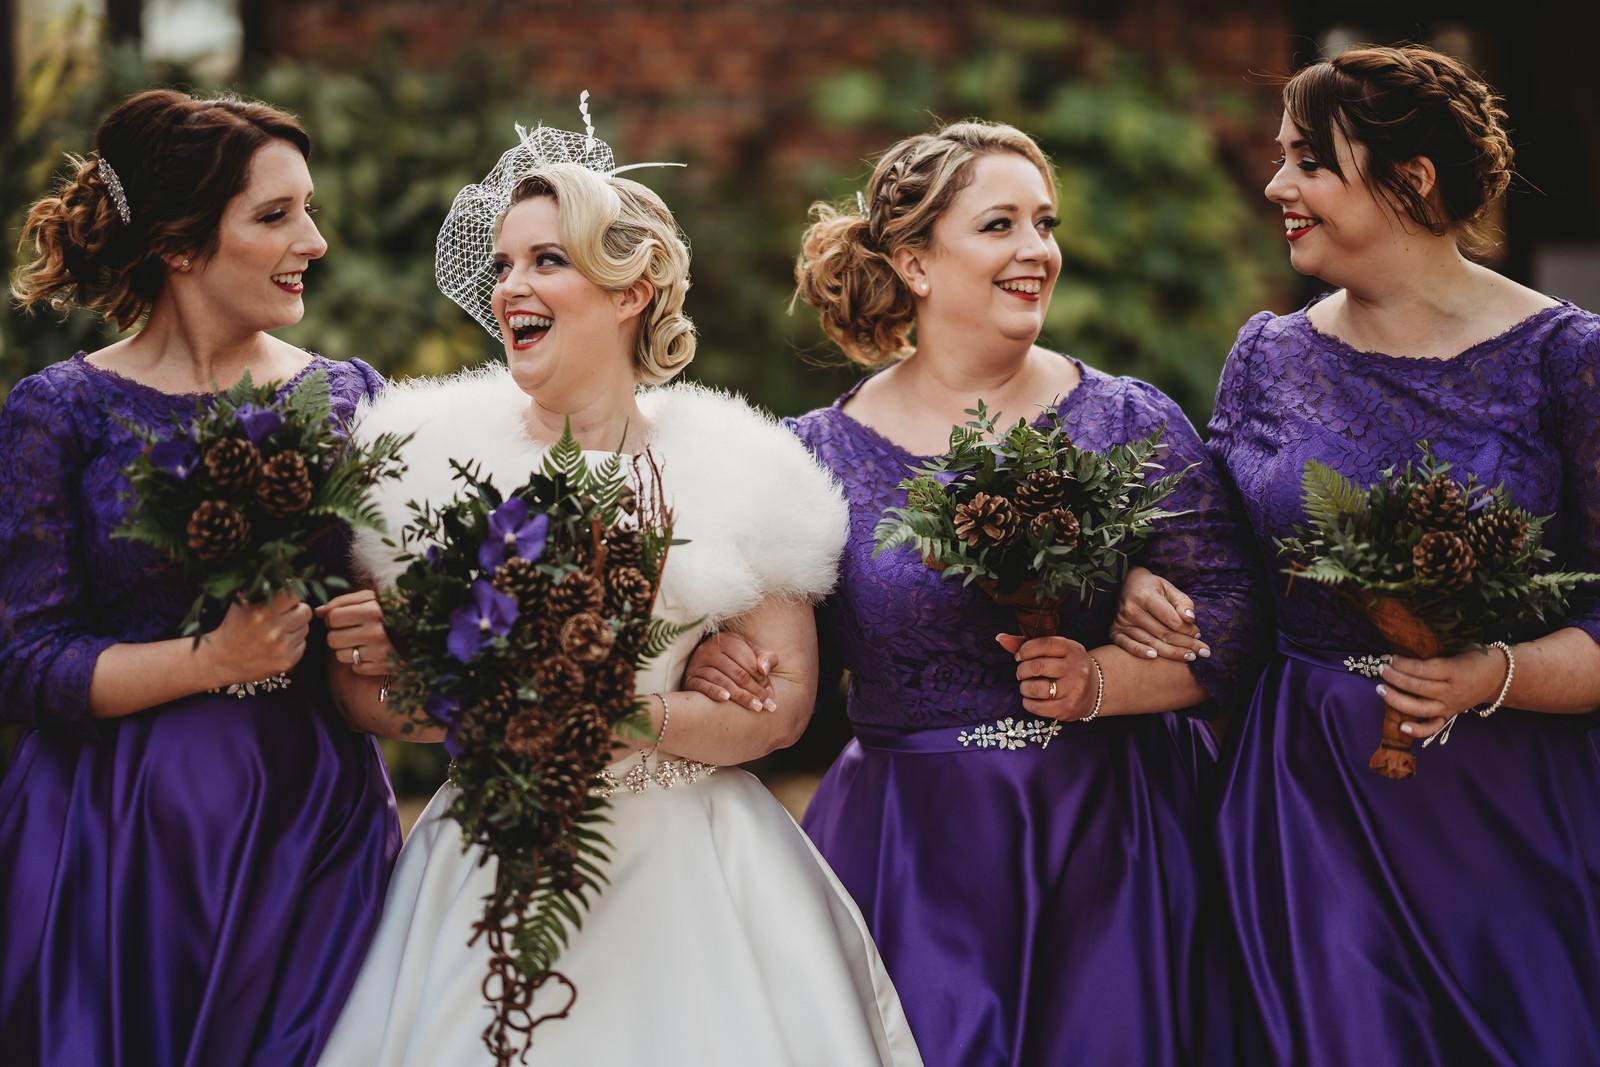 Bride and Bridesmaids full of smiles wedding photo